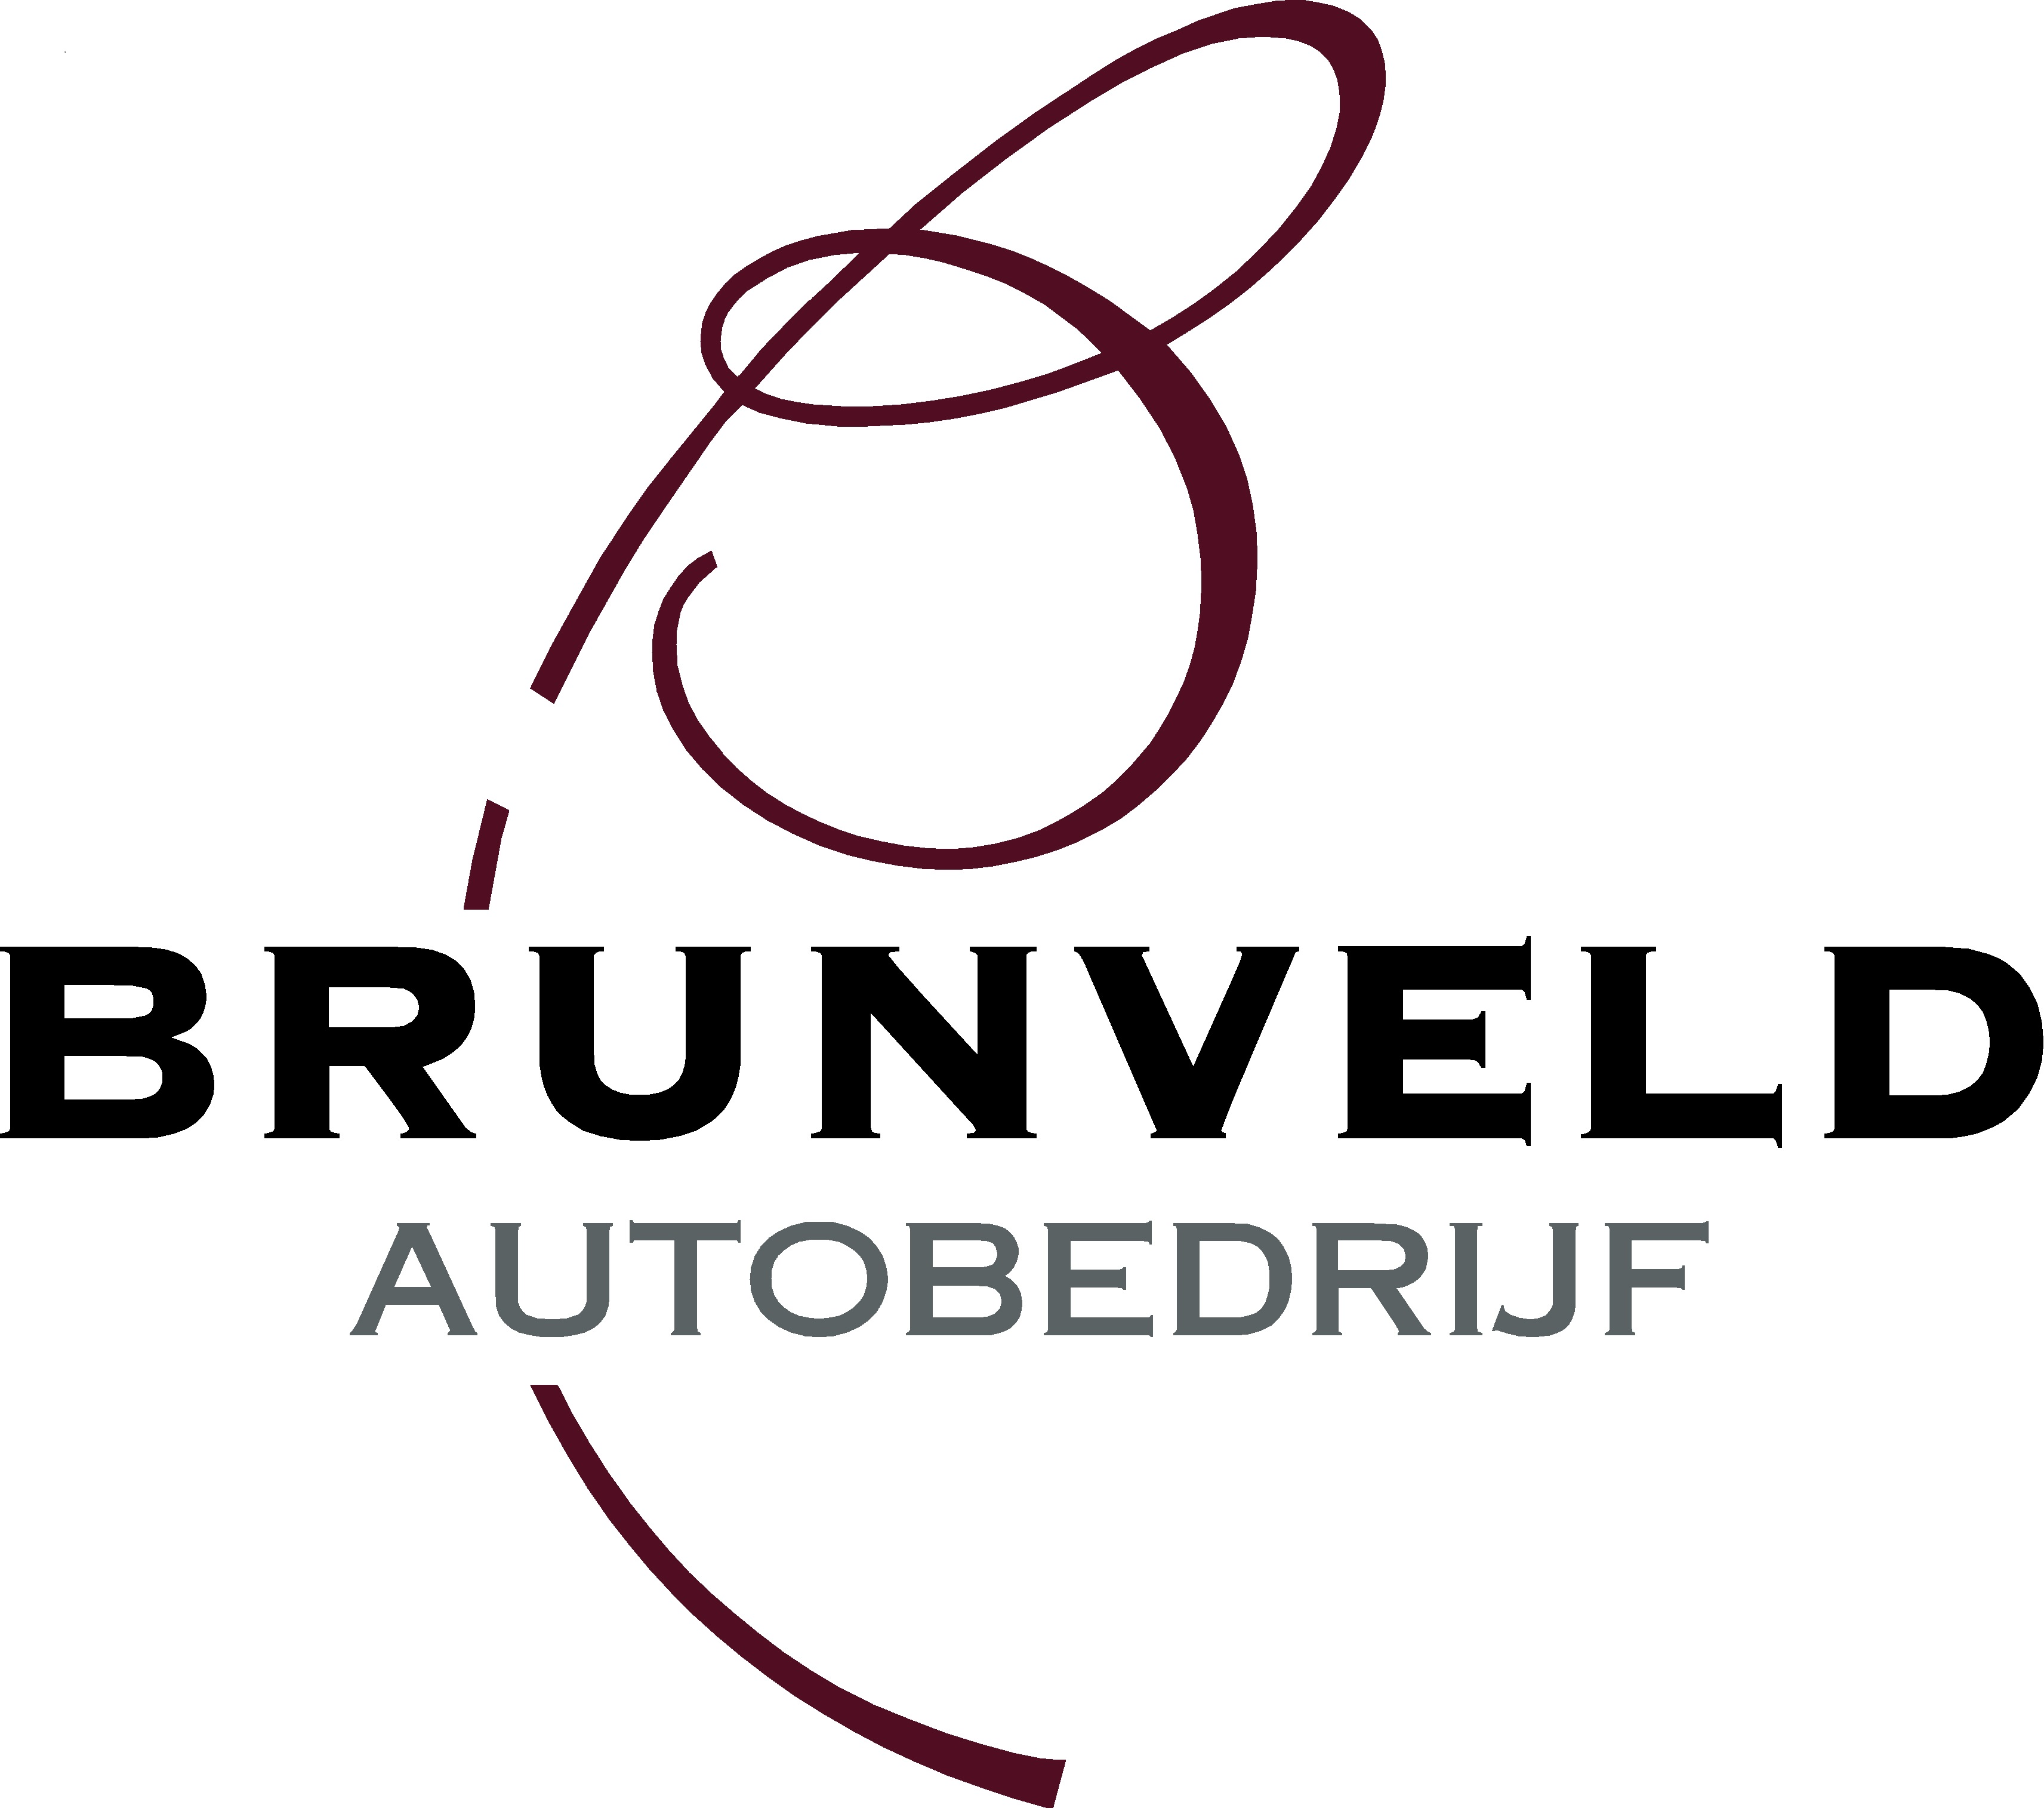 Dealer Autobedrijf Brunveld